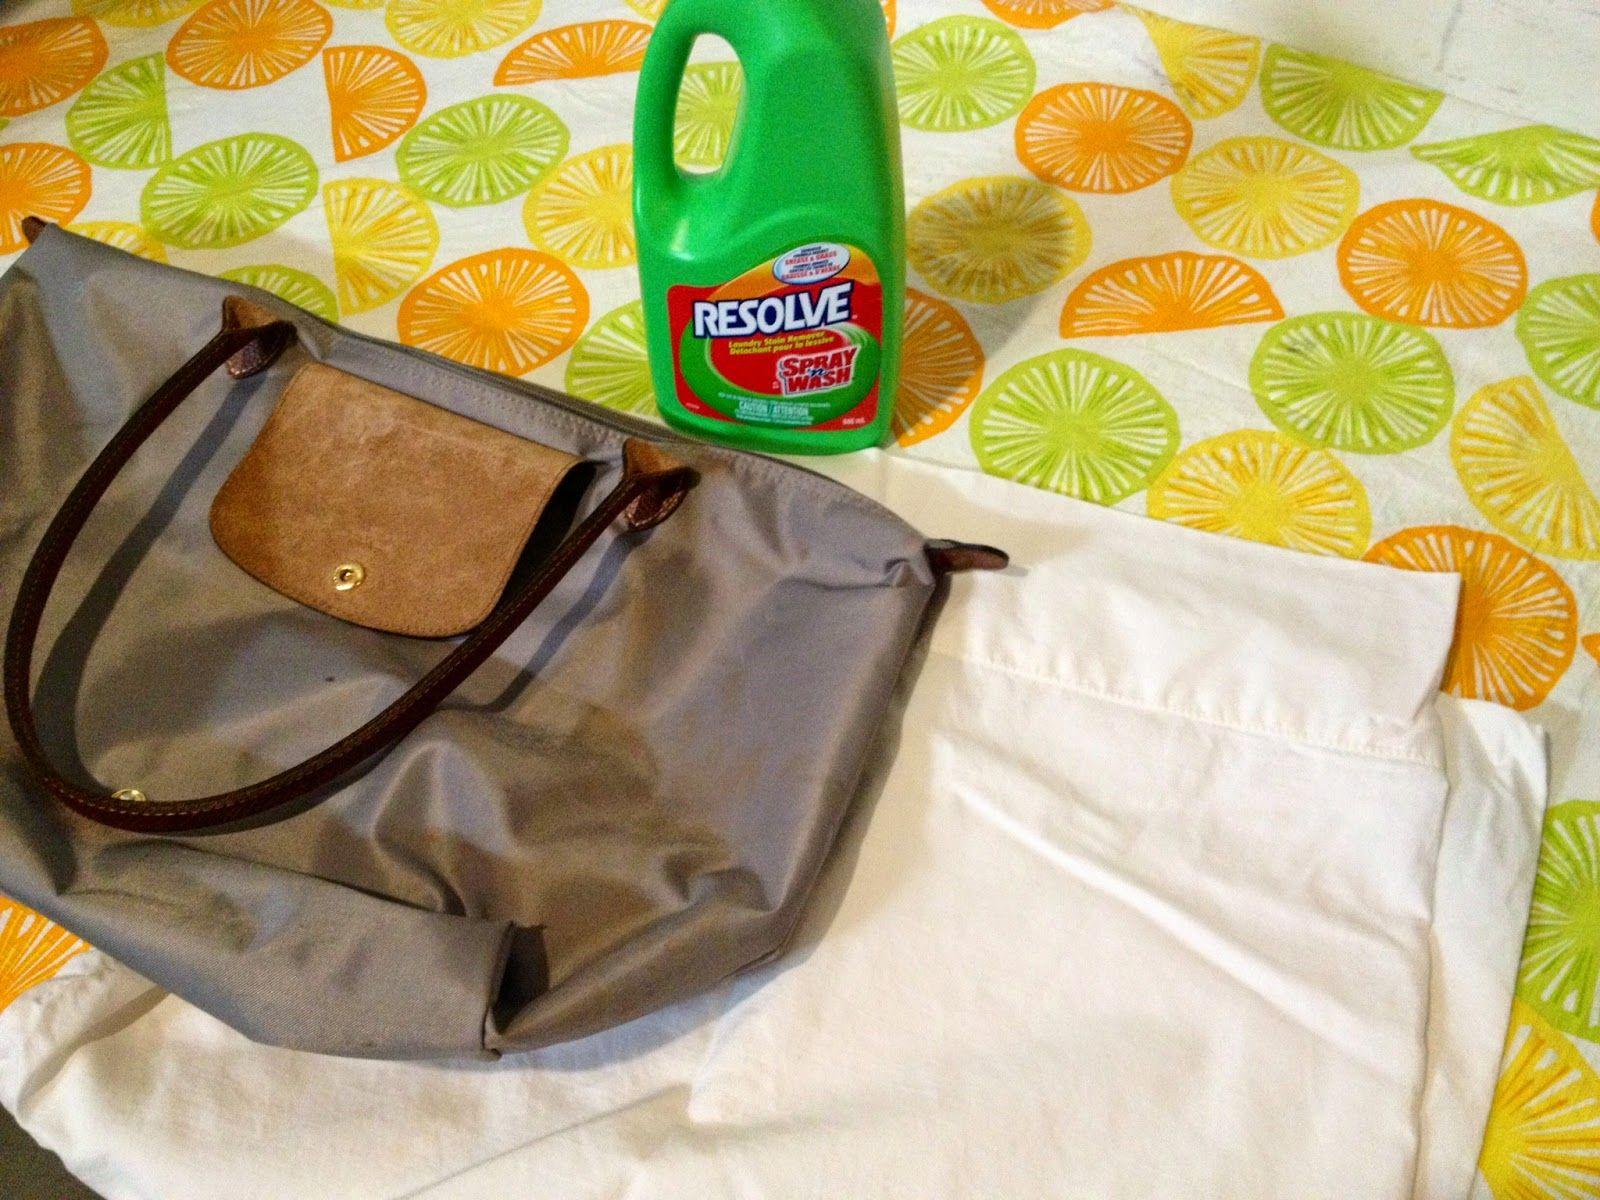 da59f24f198b Cherry Pie Twins  How To Clean A Longchamp Bag